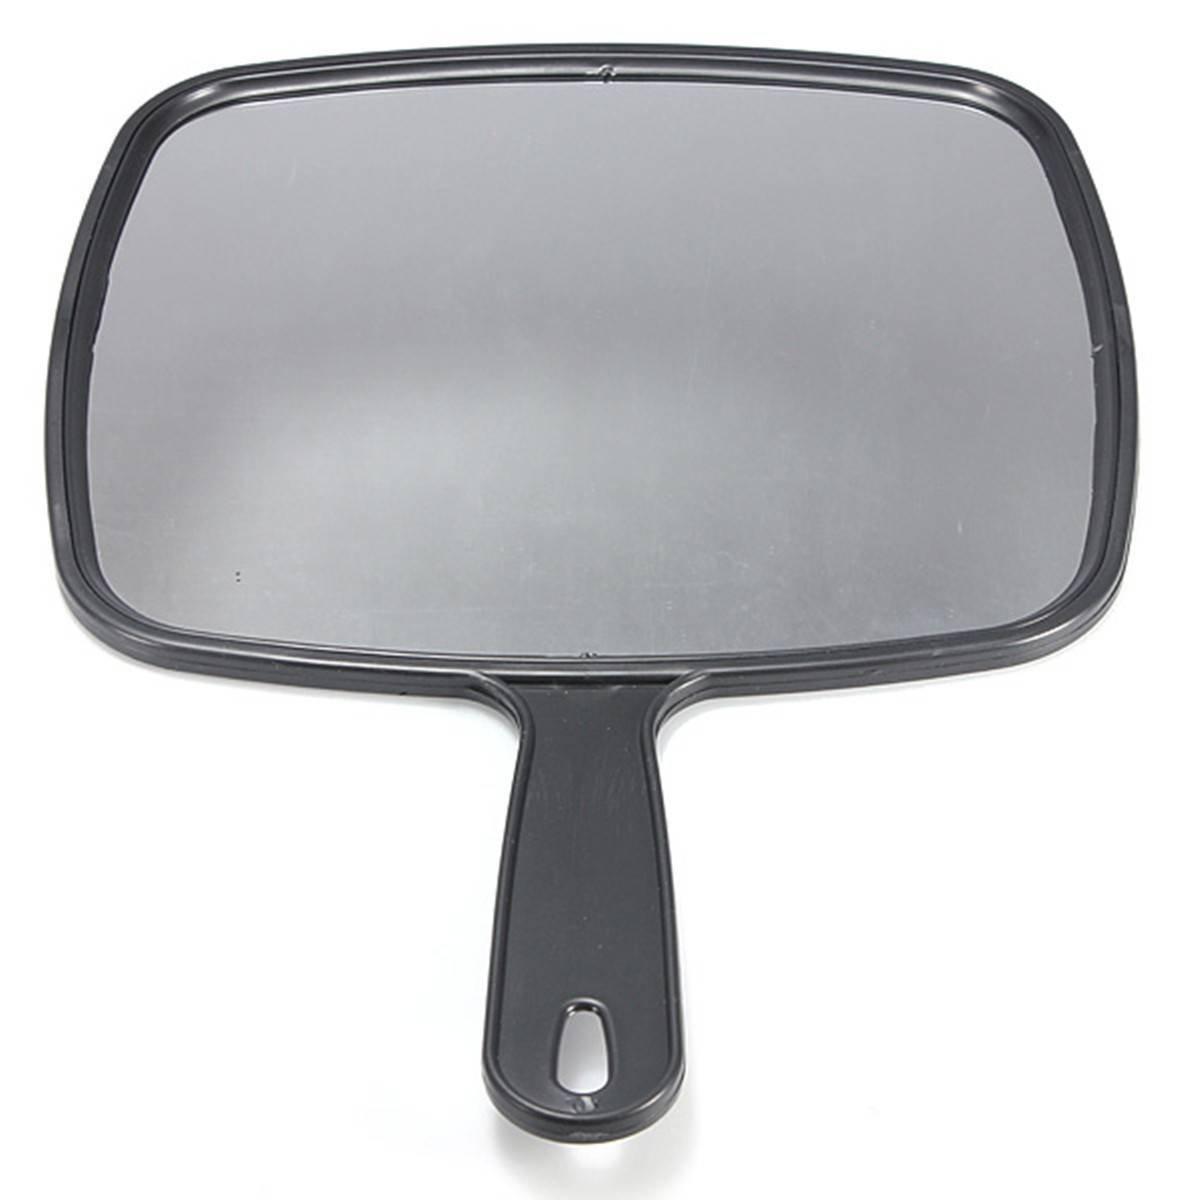 SODIAL Espejo de paleta de mano para Salon Barberos Peluqueria Espejo de paletas Herramienta con mango Negro para Maquillaje Peluqueria 049631